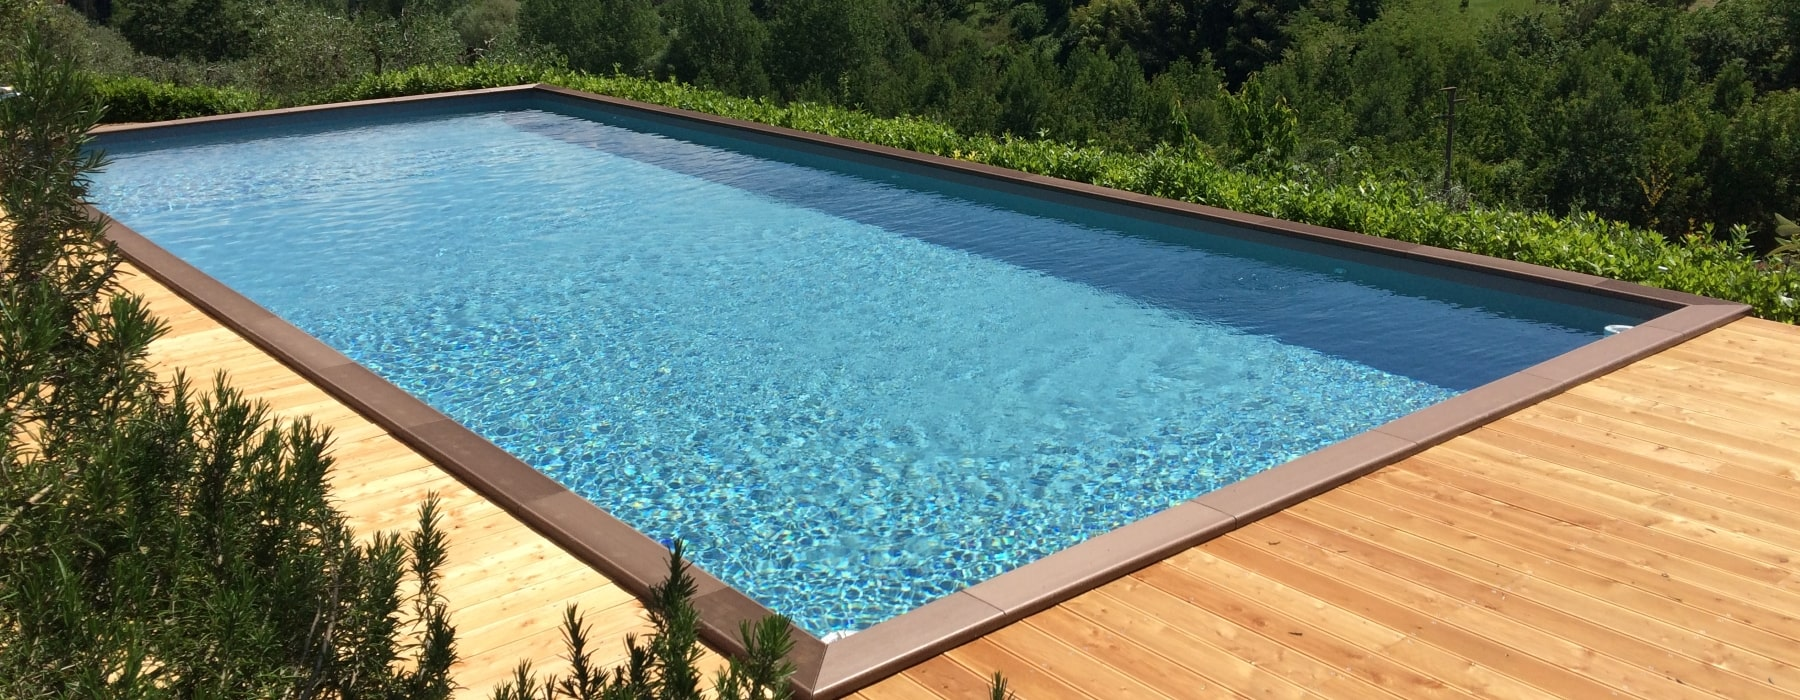 Above Ground Wooden Pools Garden Pool Realizzazione